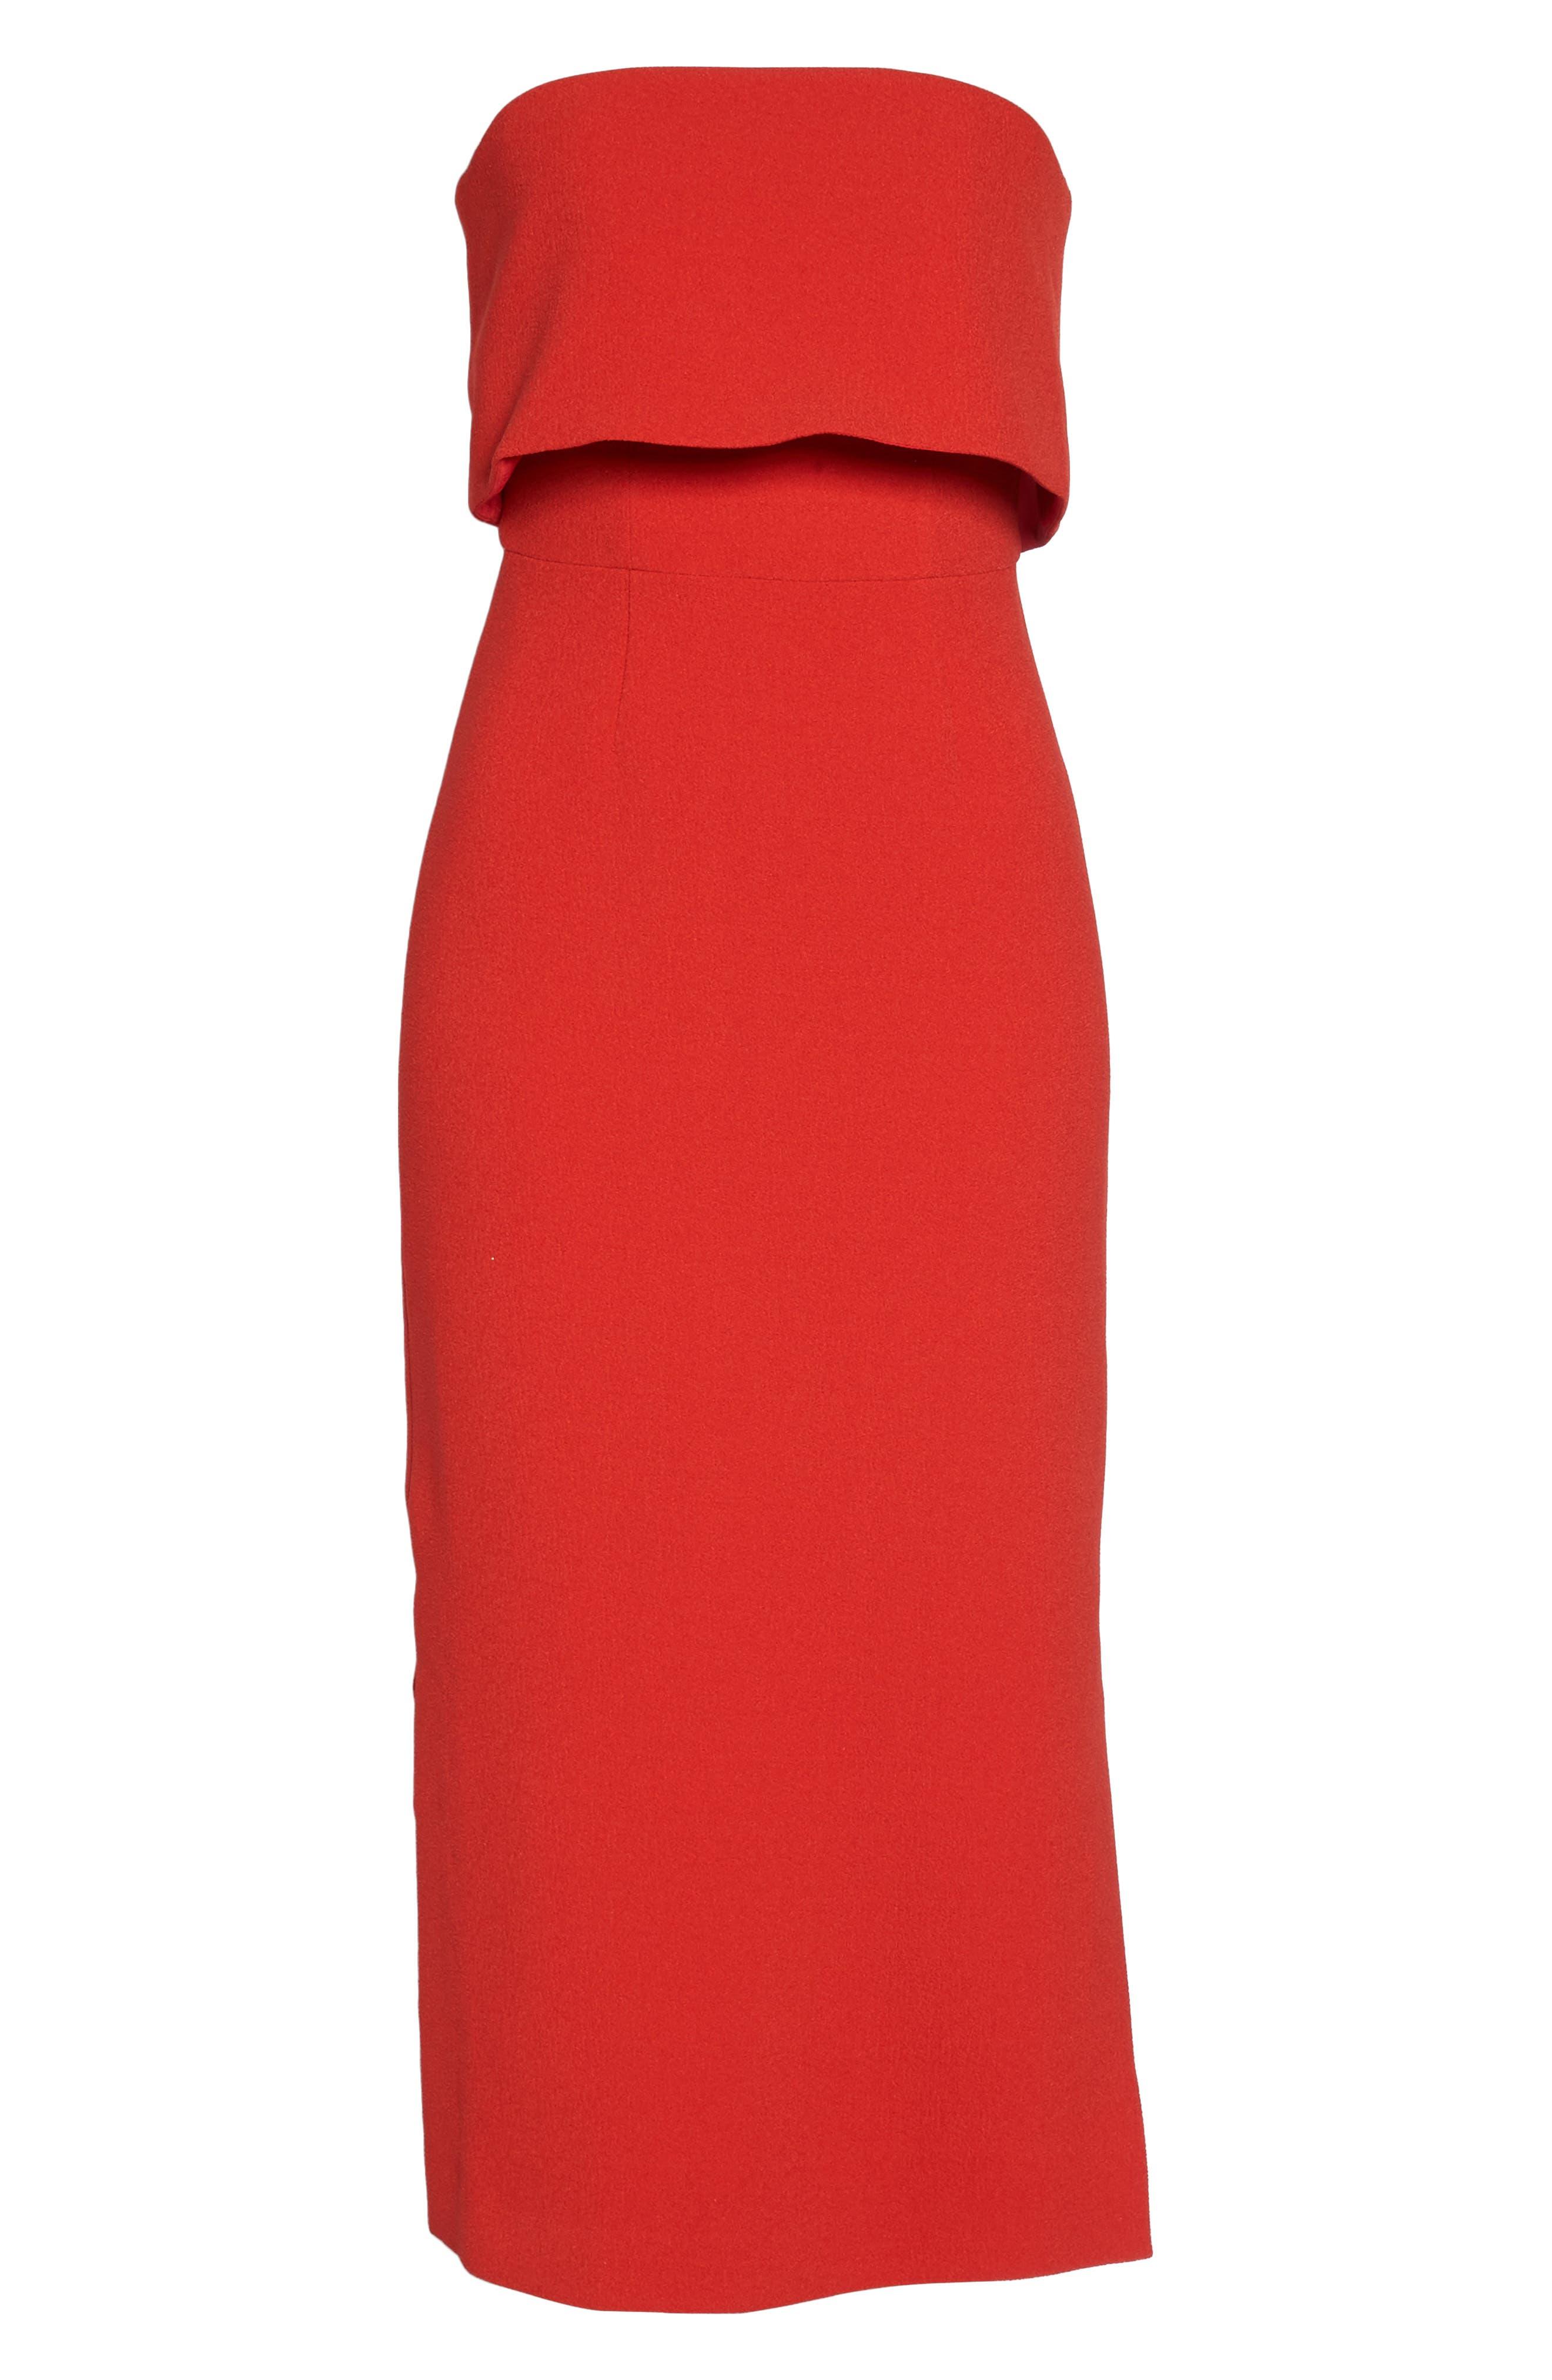 Entice Strapless Midi Dress,                             Alternate thumbnail 6, color,                             Red